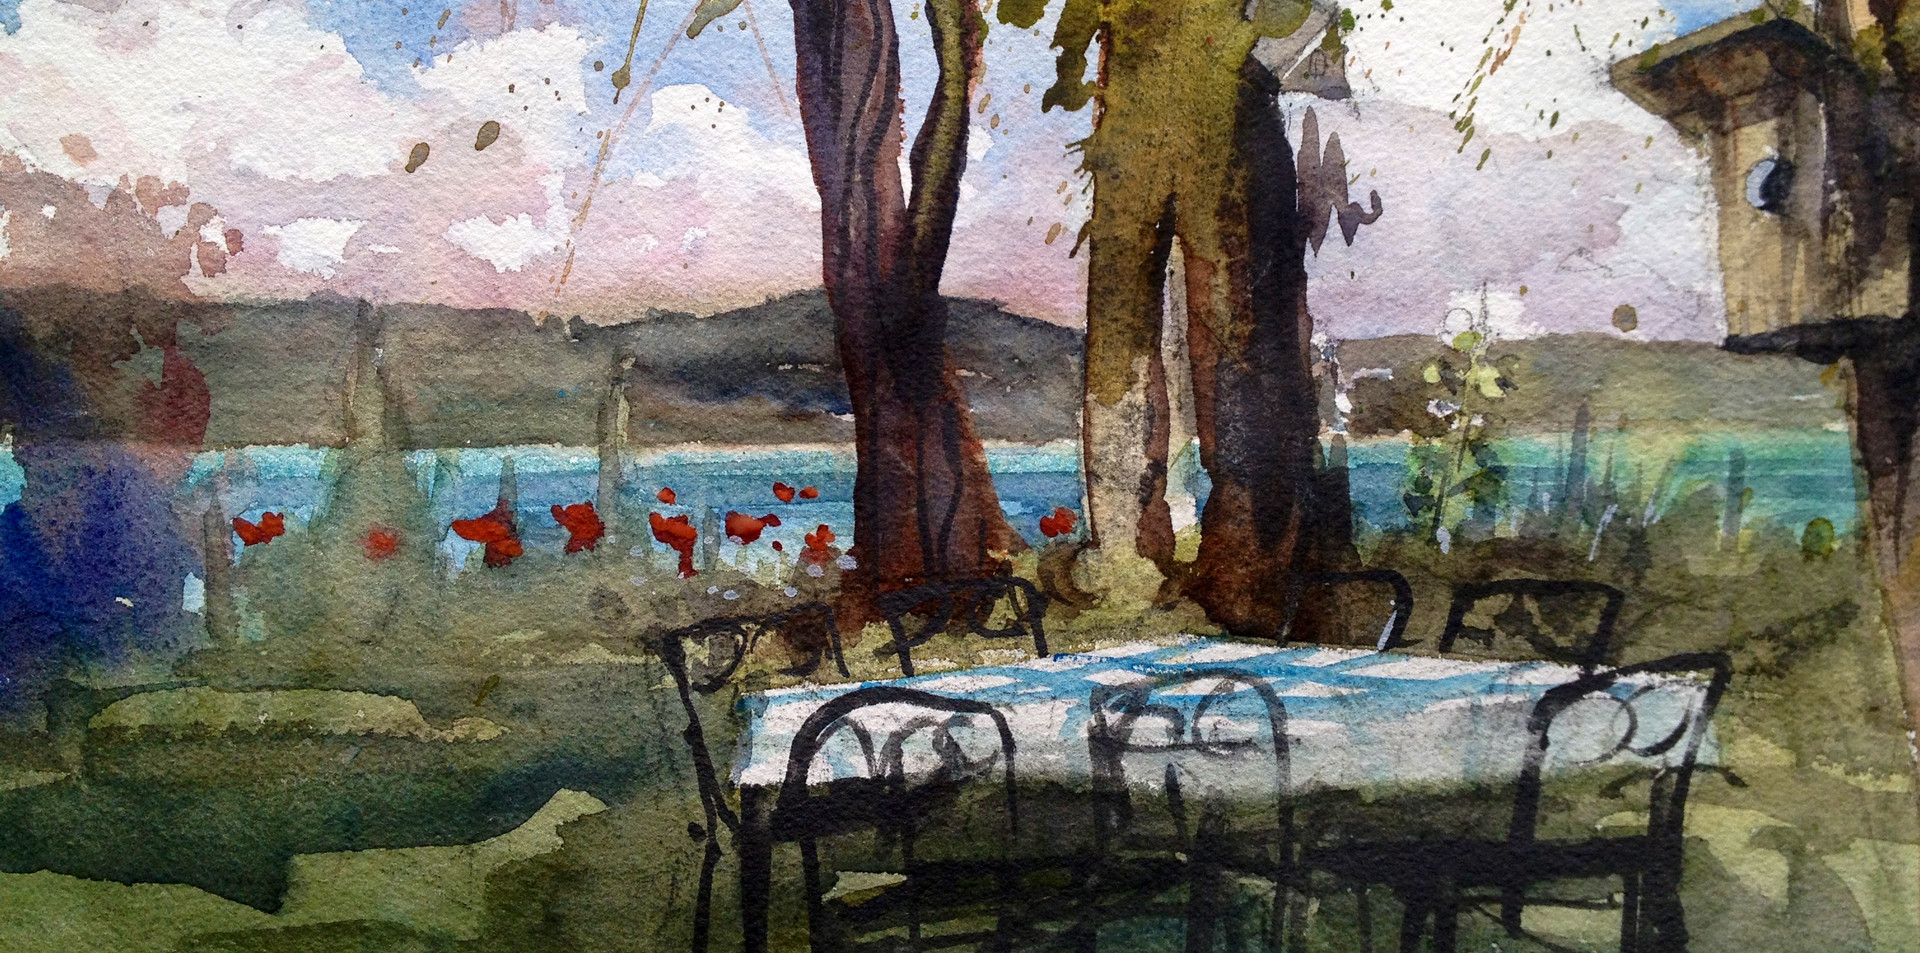 Whidbey Island picnic